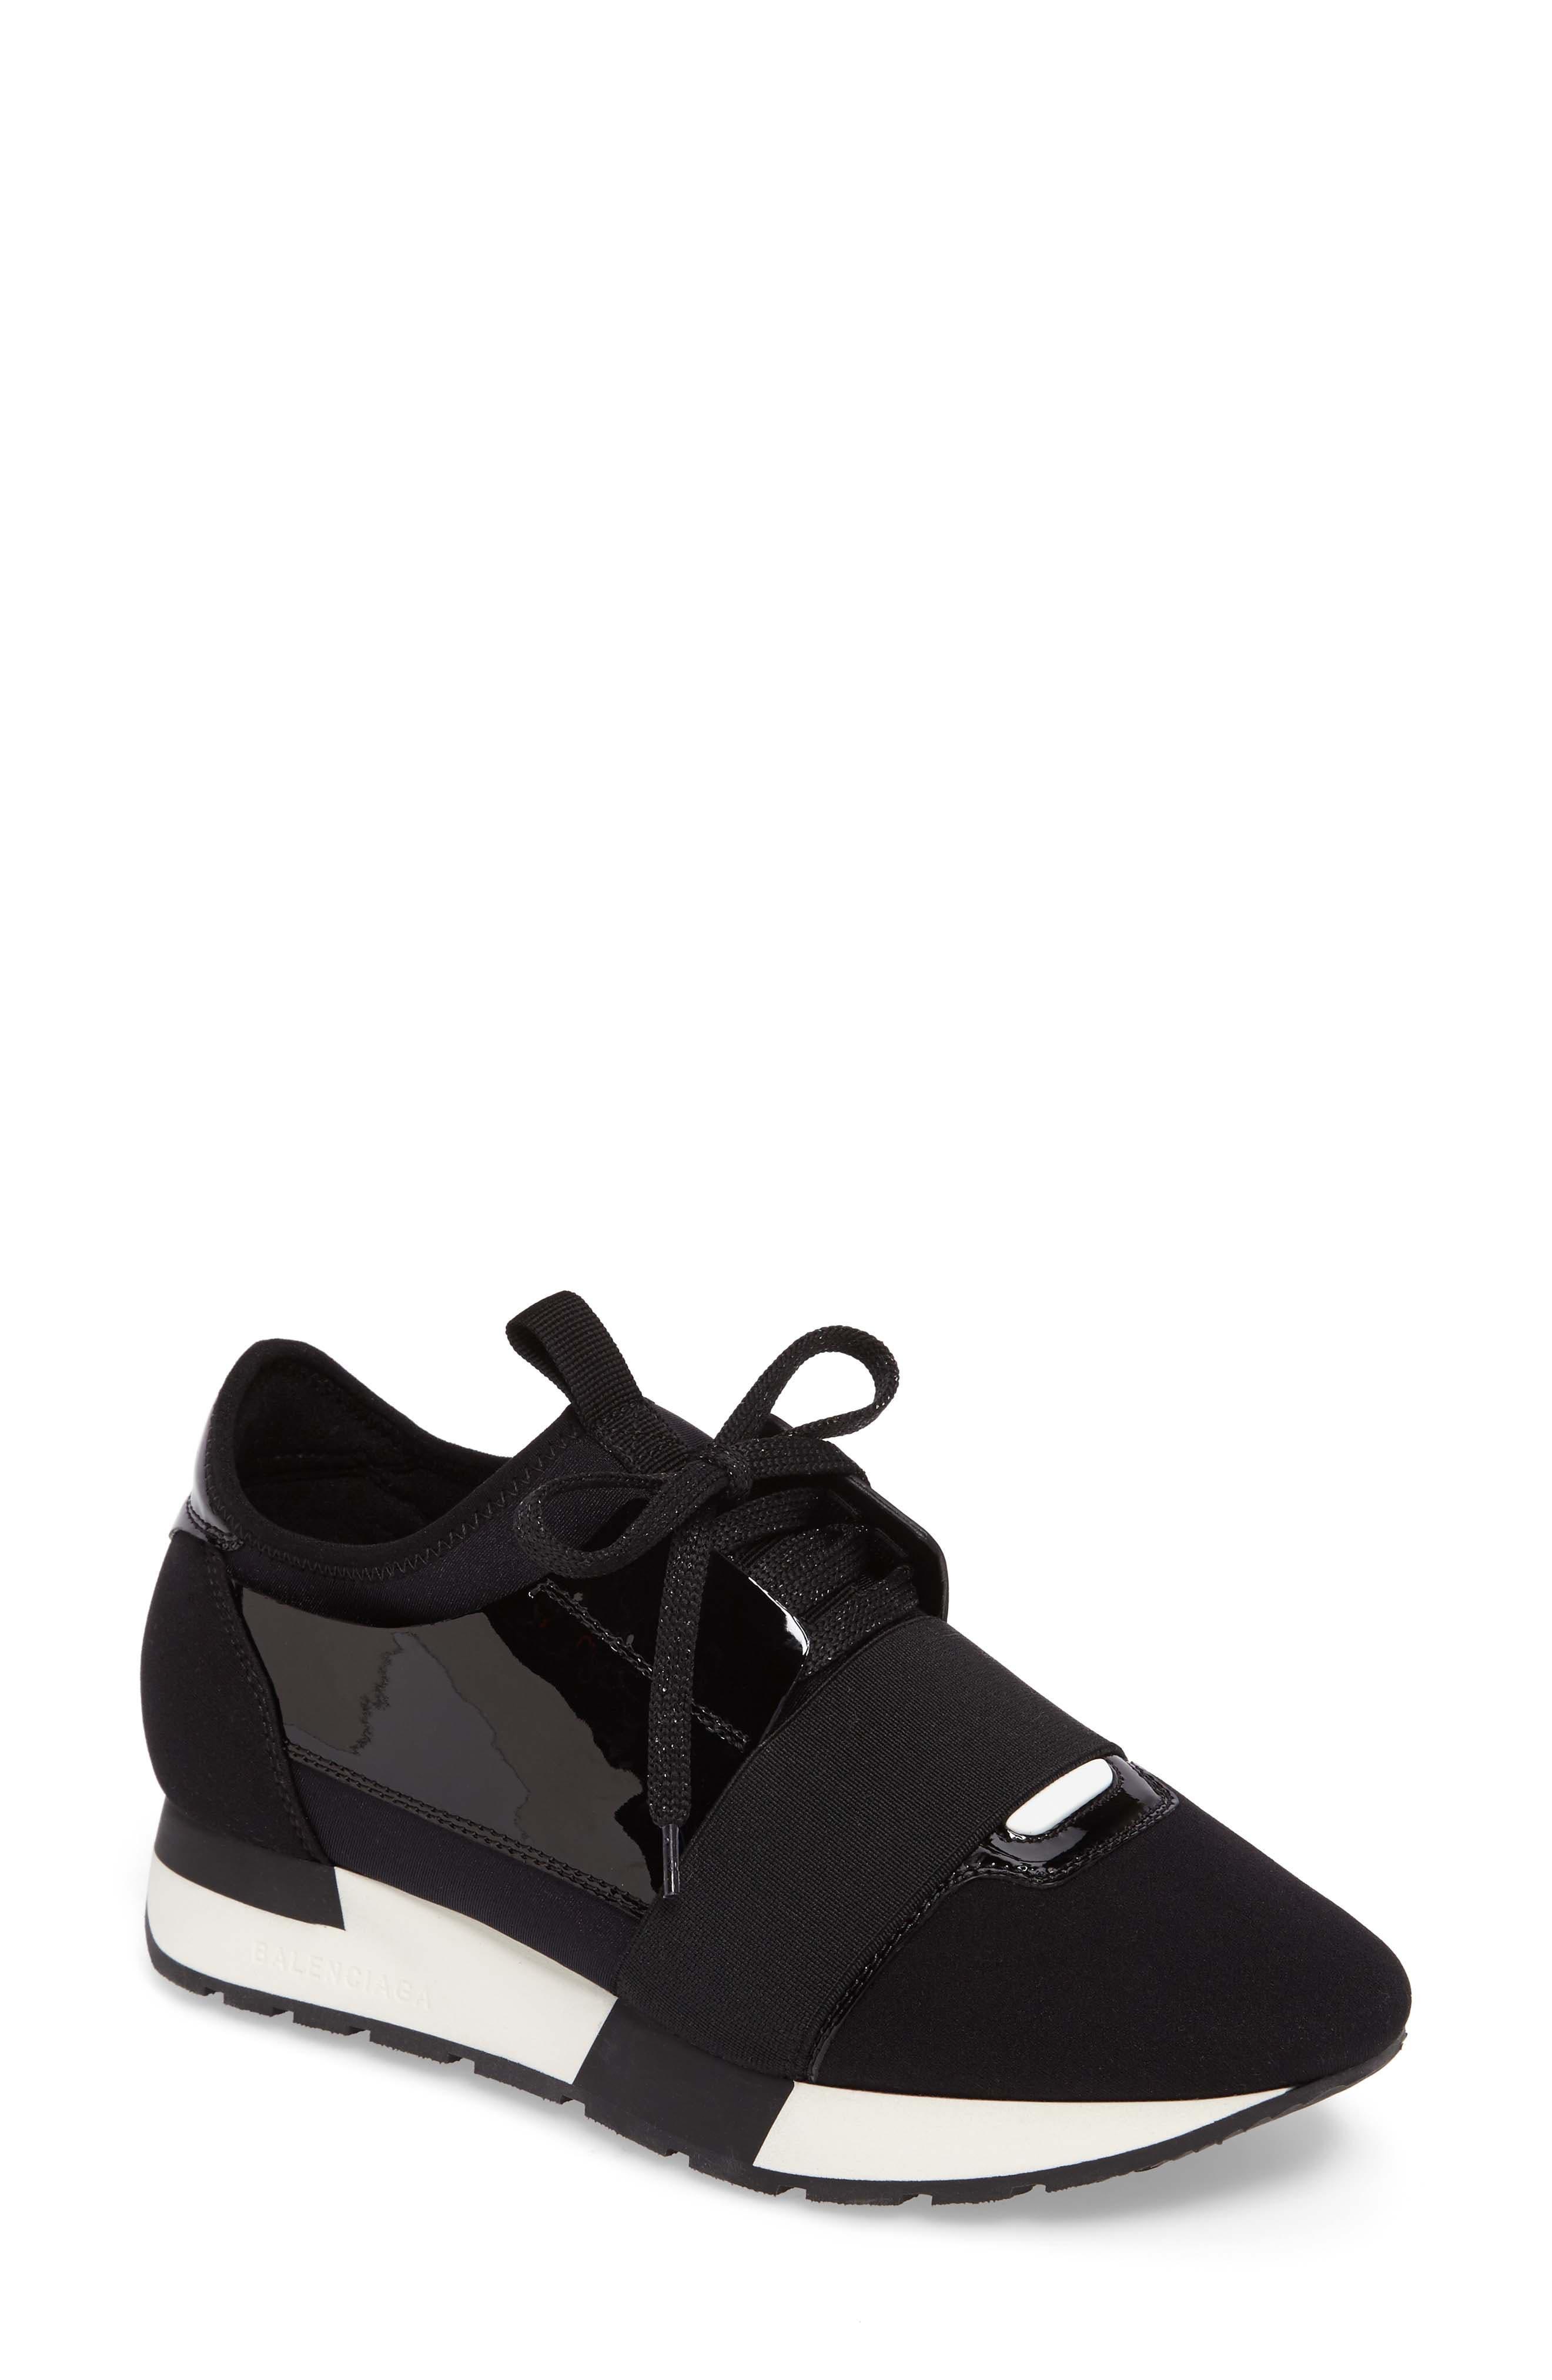 Balenciaga Trainer Sneakers (Women)